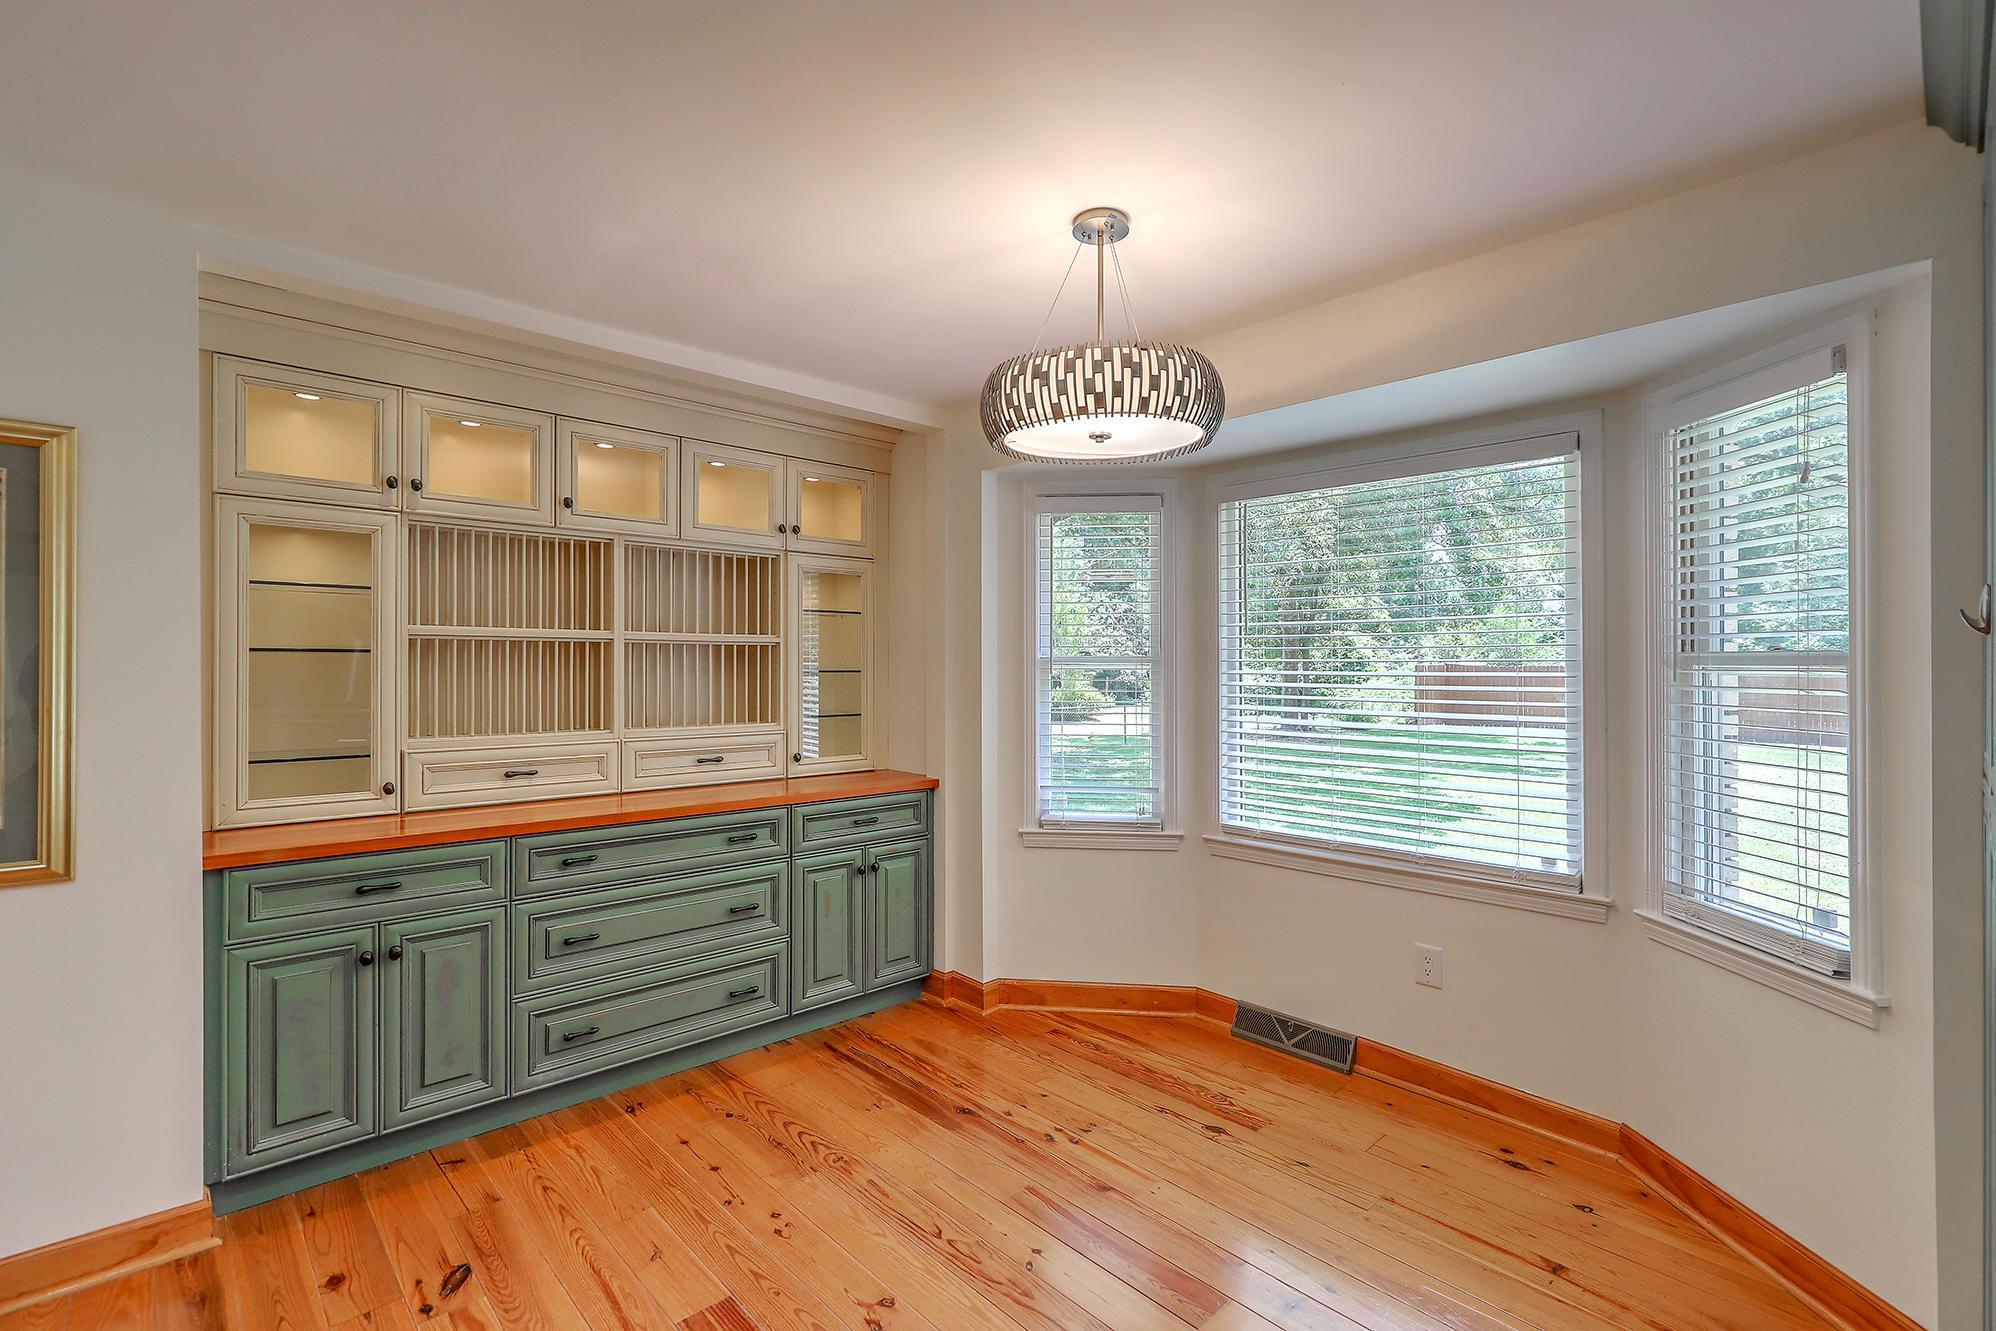 Edgewater Park Homes For Sale - 1413 Edsent, Charleston, SC - 9